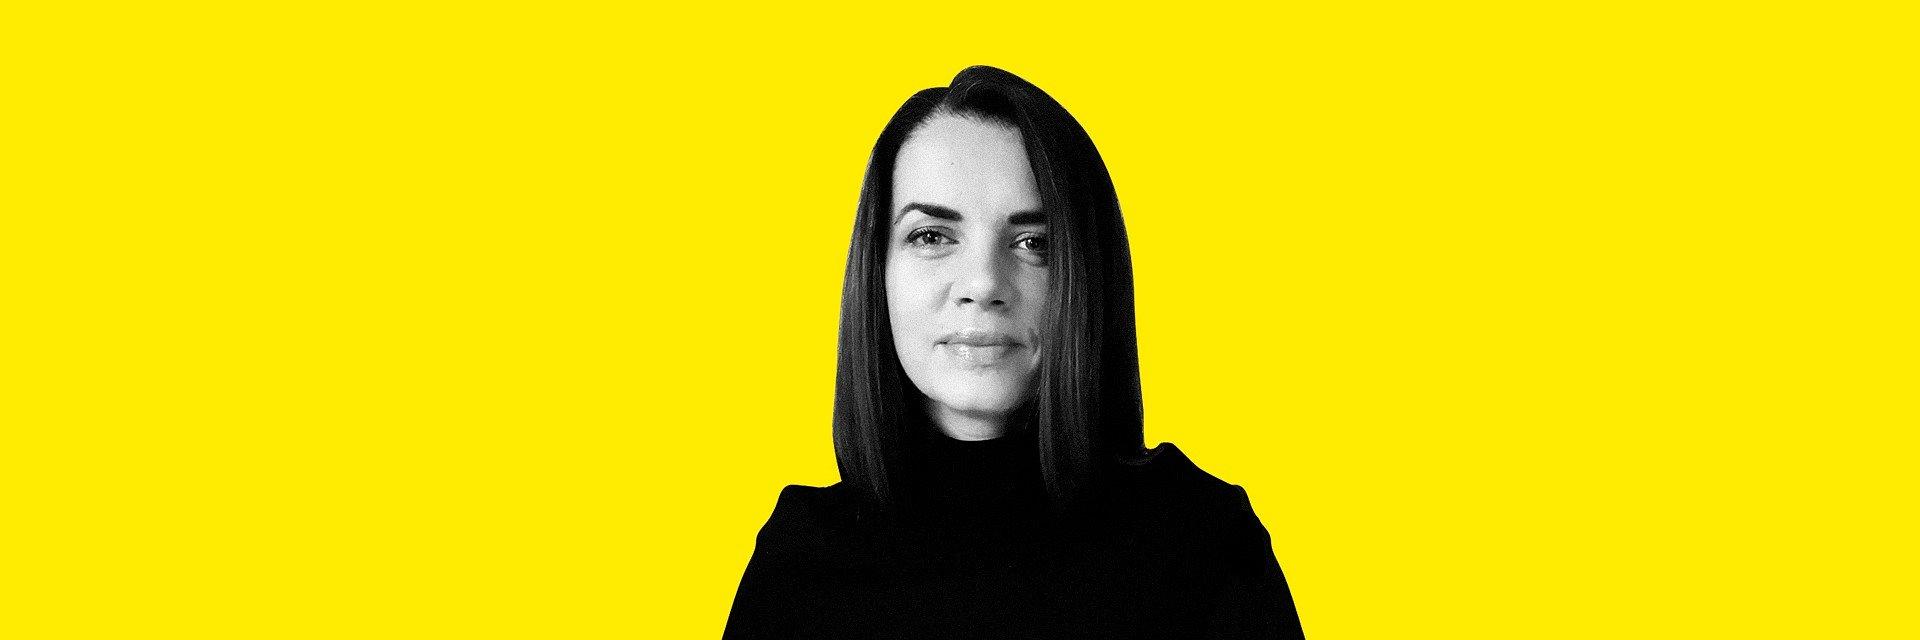 Magdalena Korczak awansuje na Client Service Director w Scholz & Friends Warszawa (Grupa S/F)